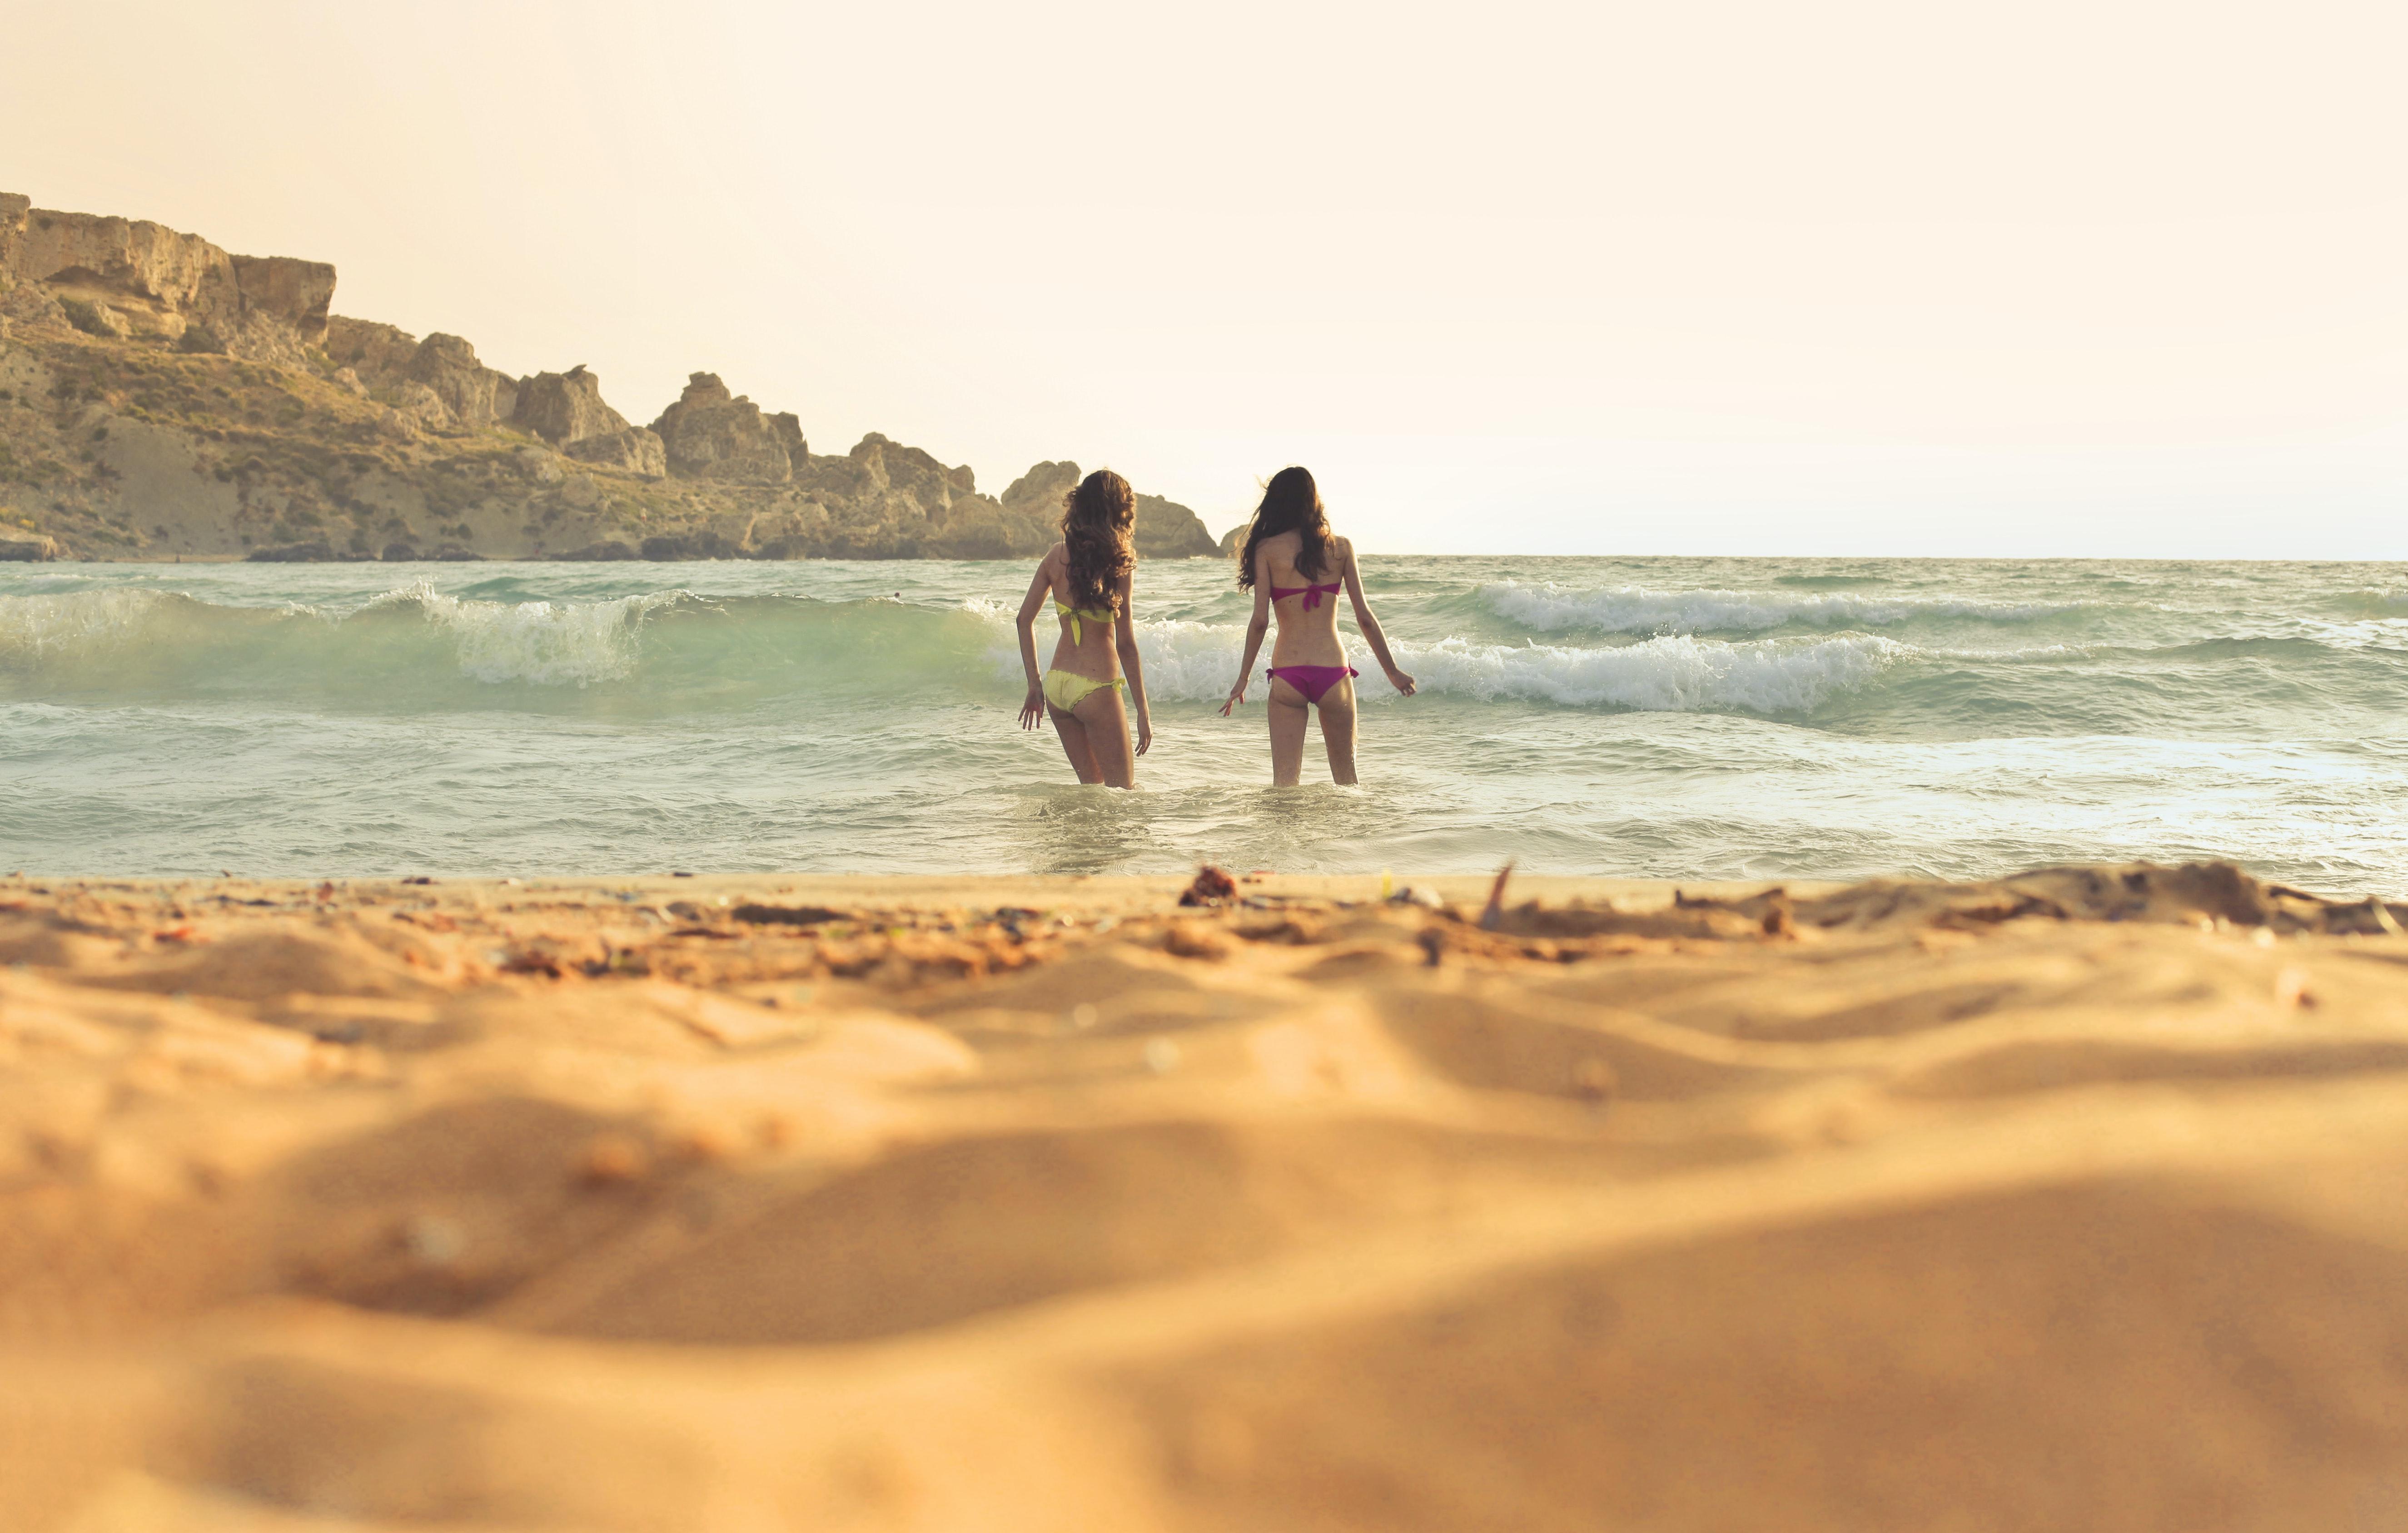 Agree free beach bikini photographs speaking